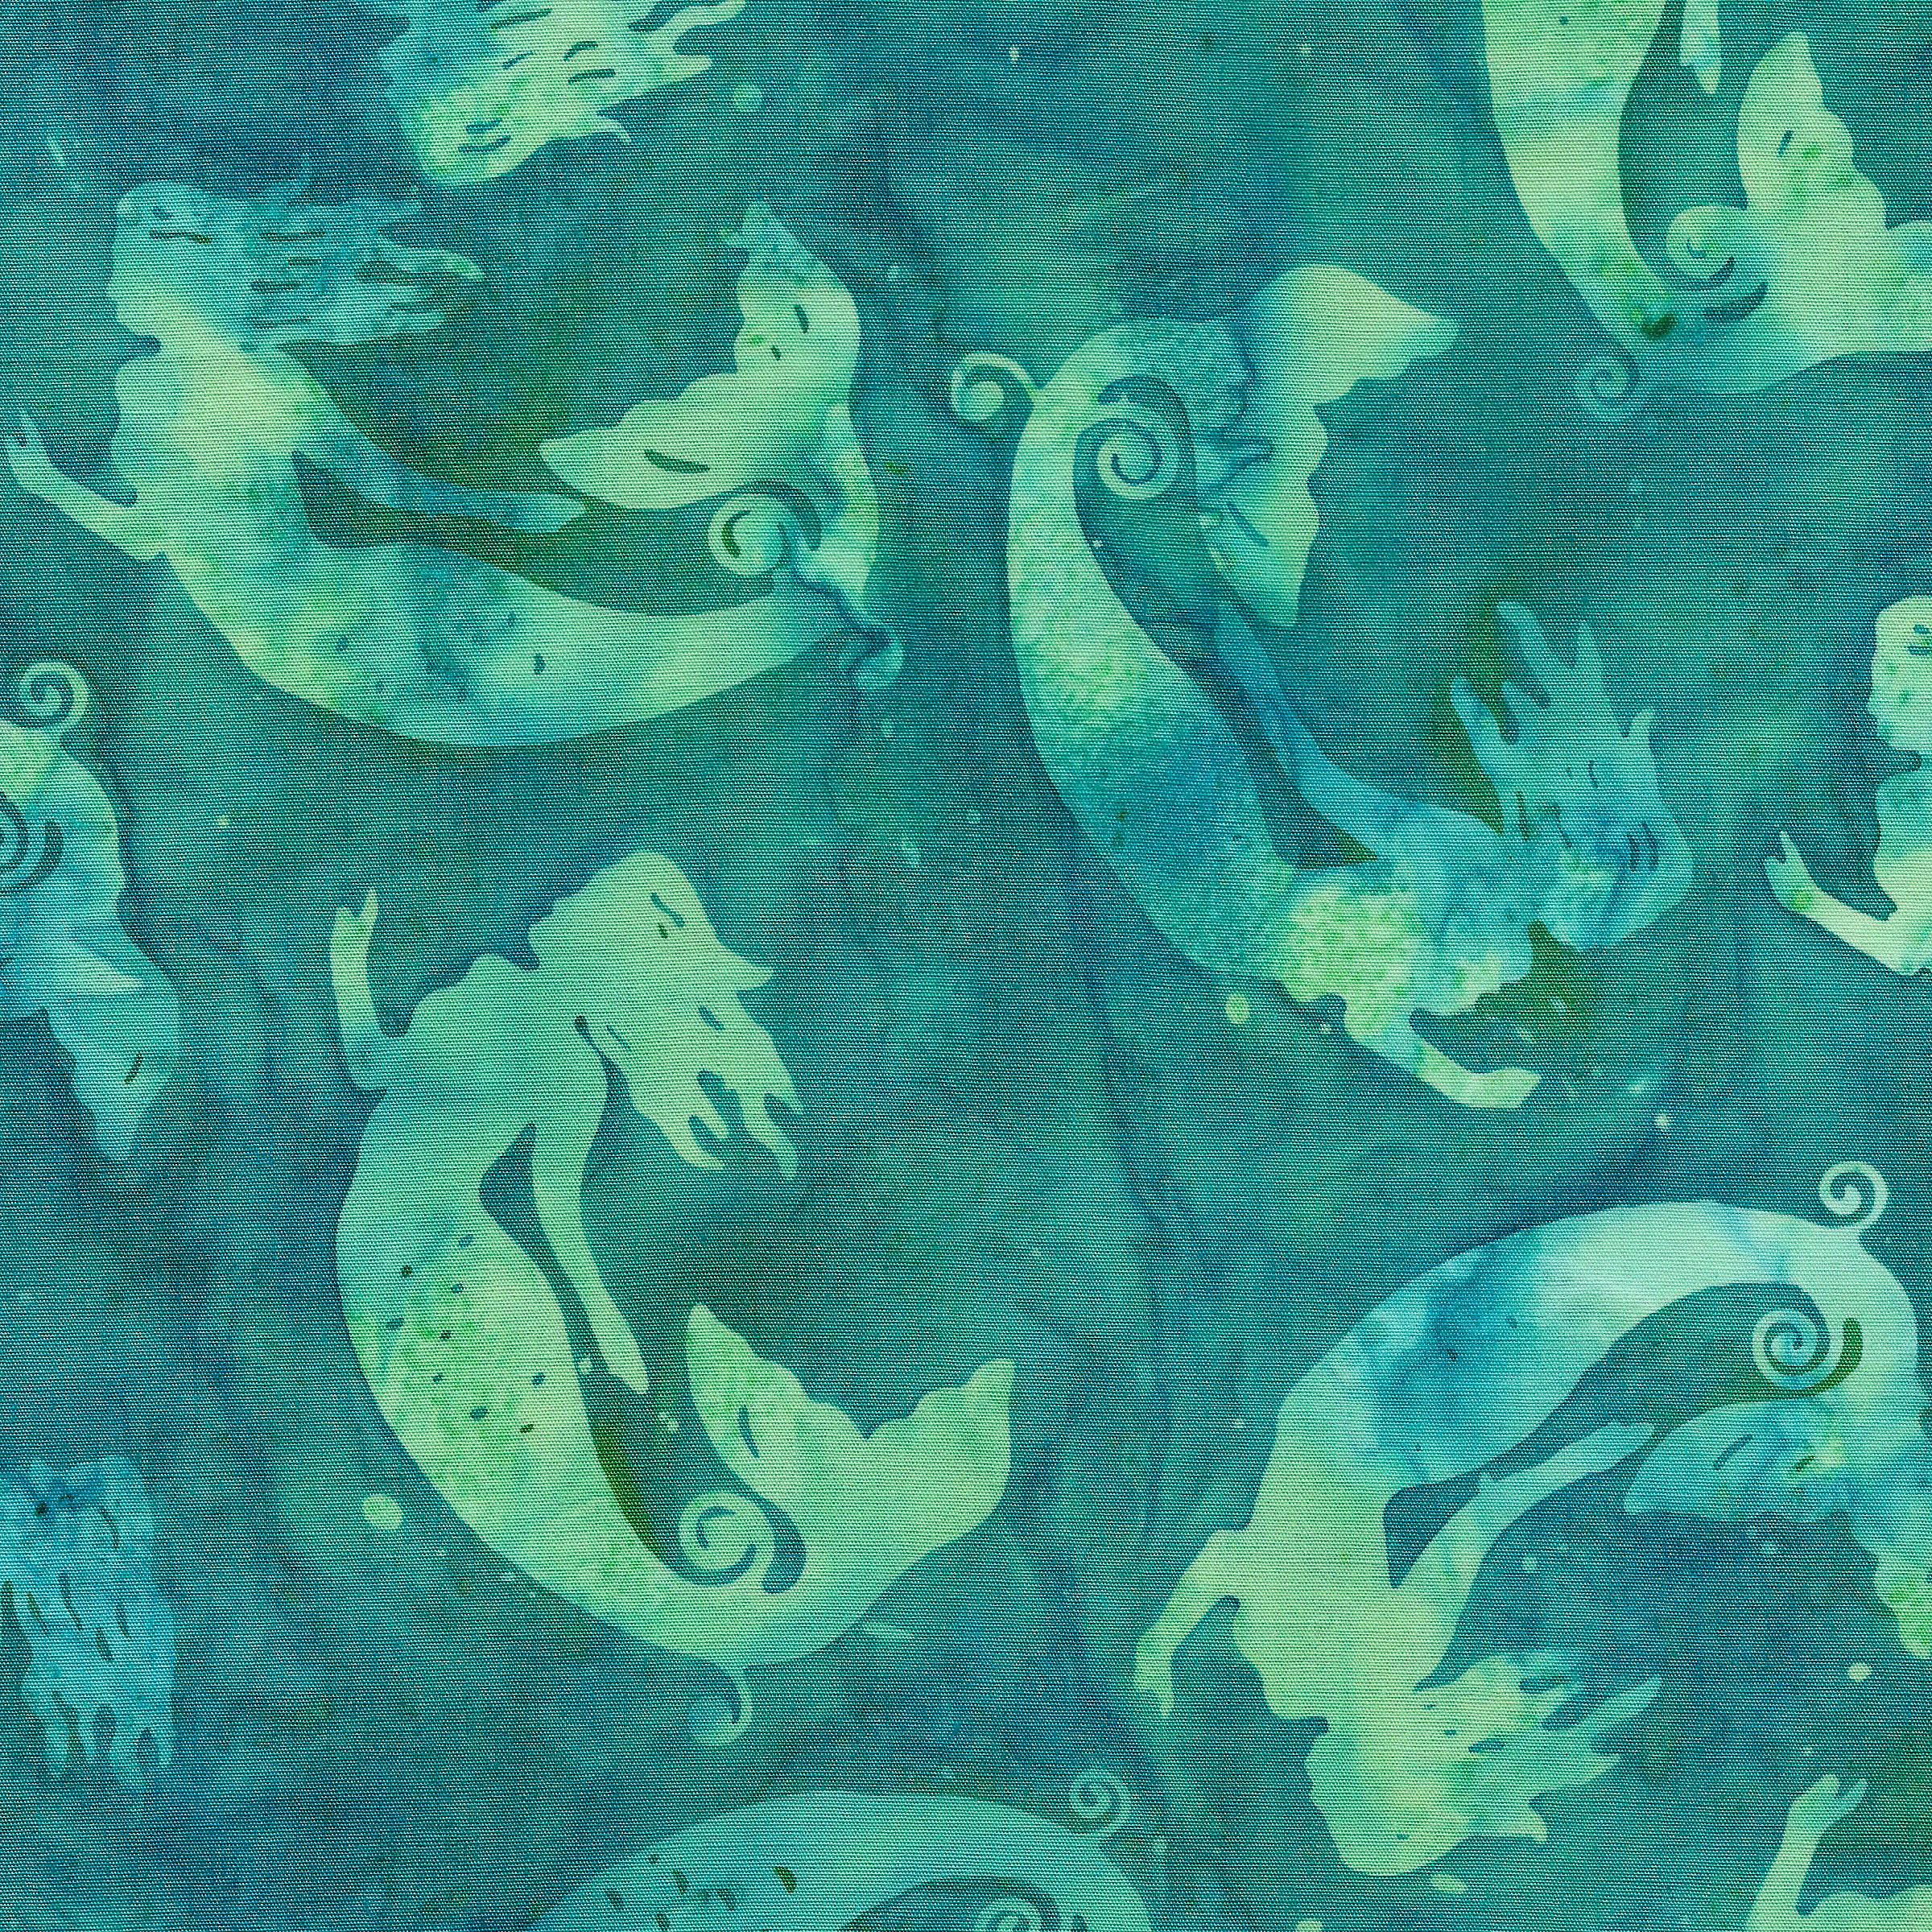 Mermaid Cove Turquoise Tossed Mermaid 111907550